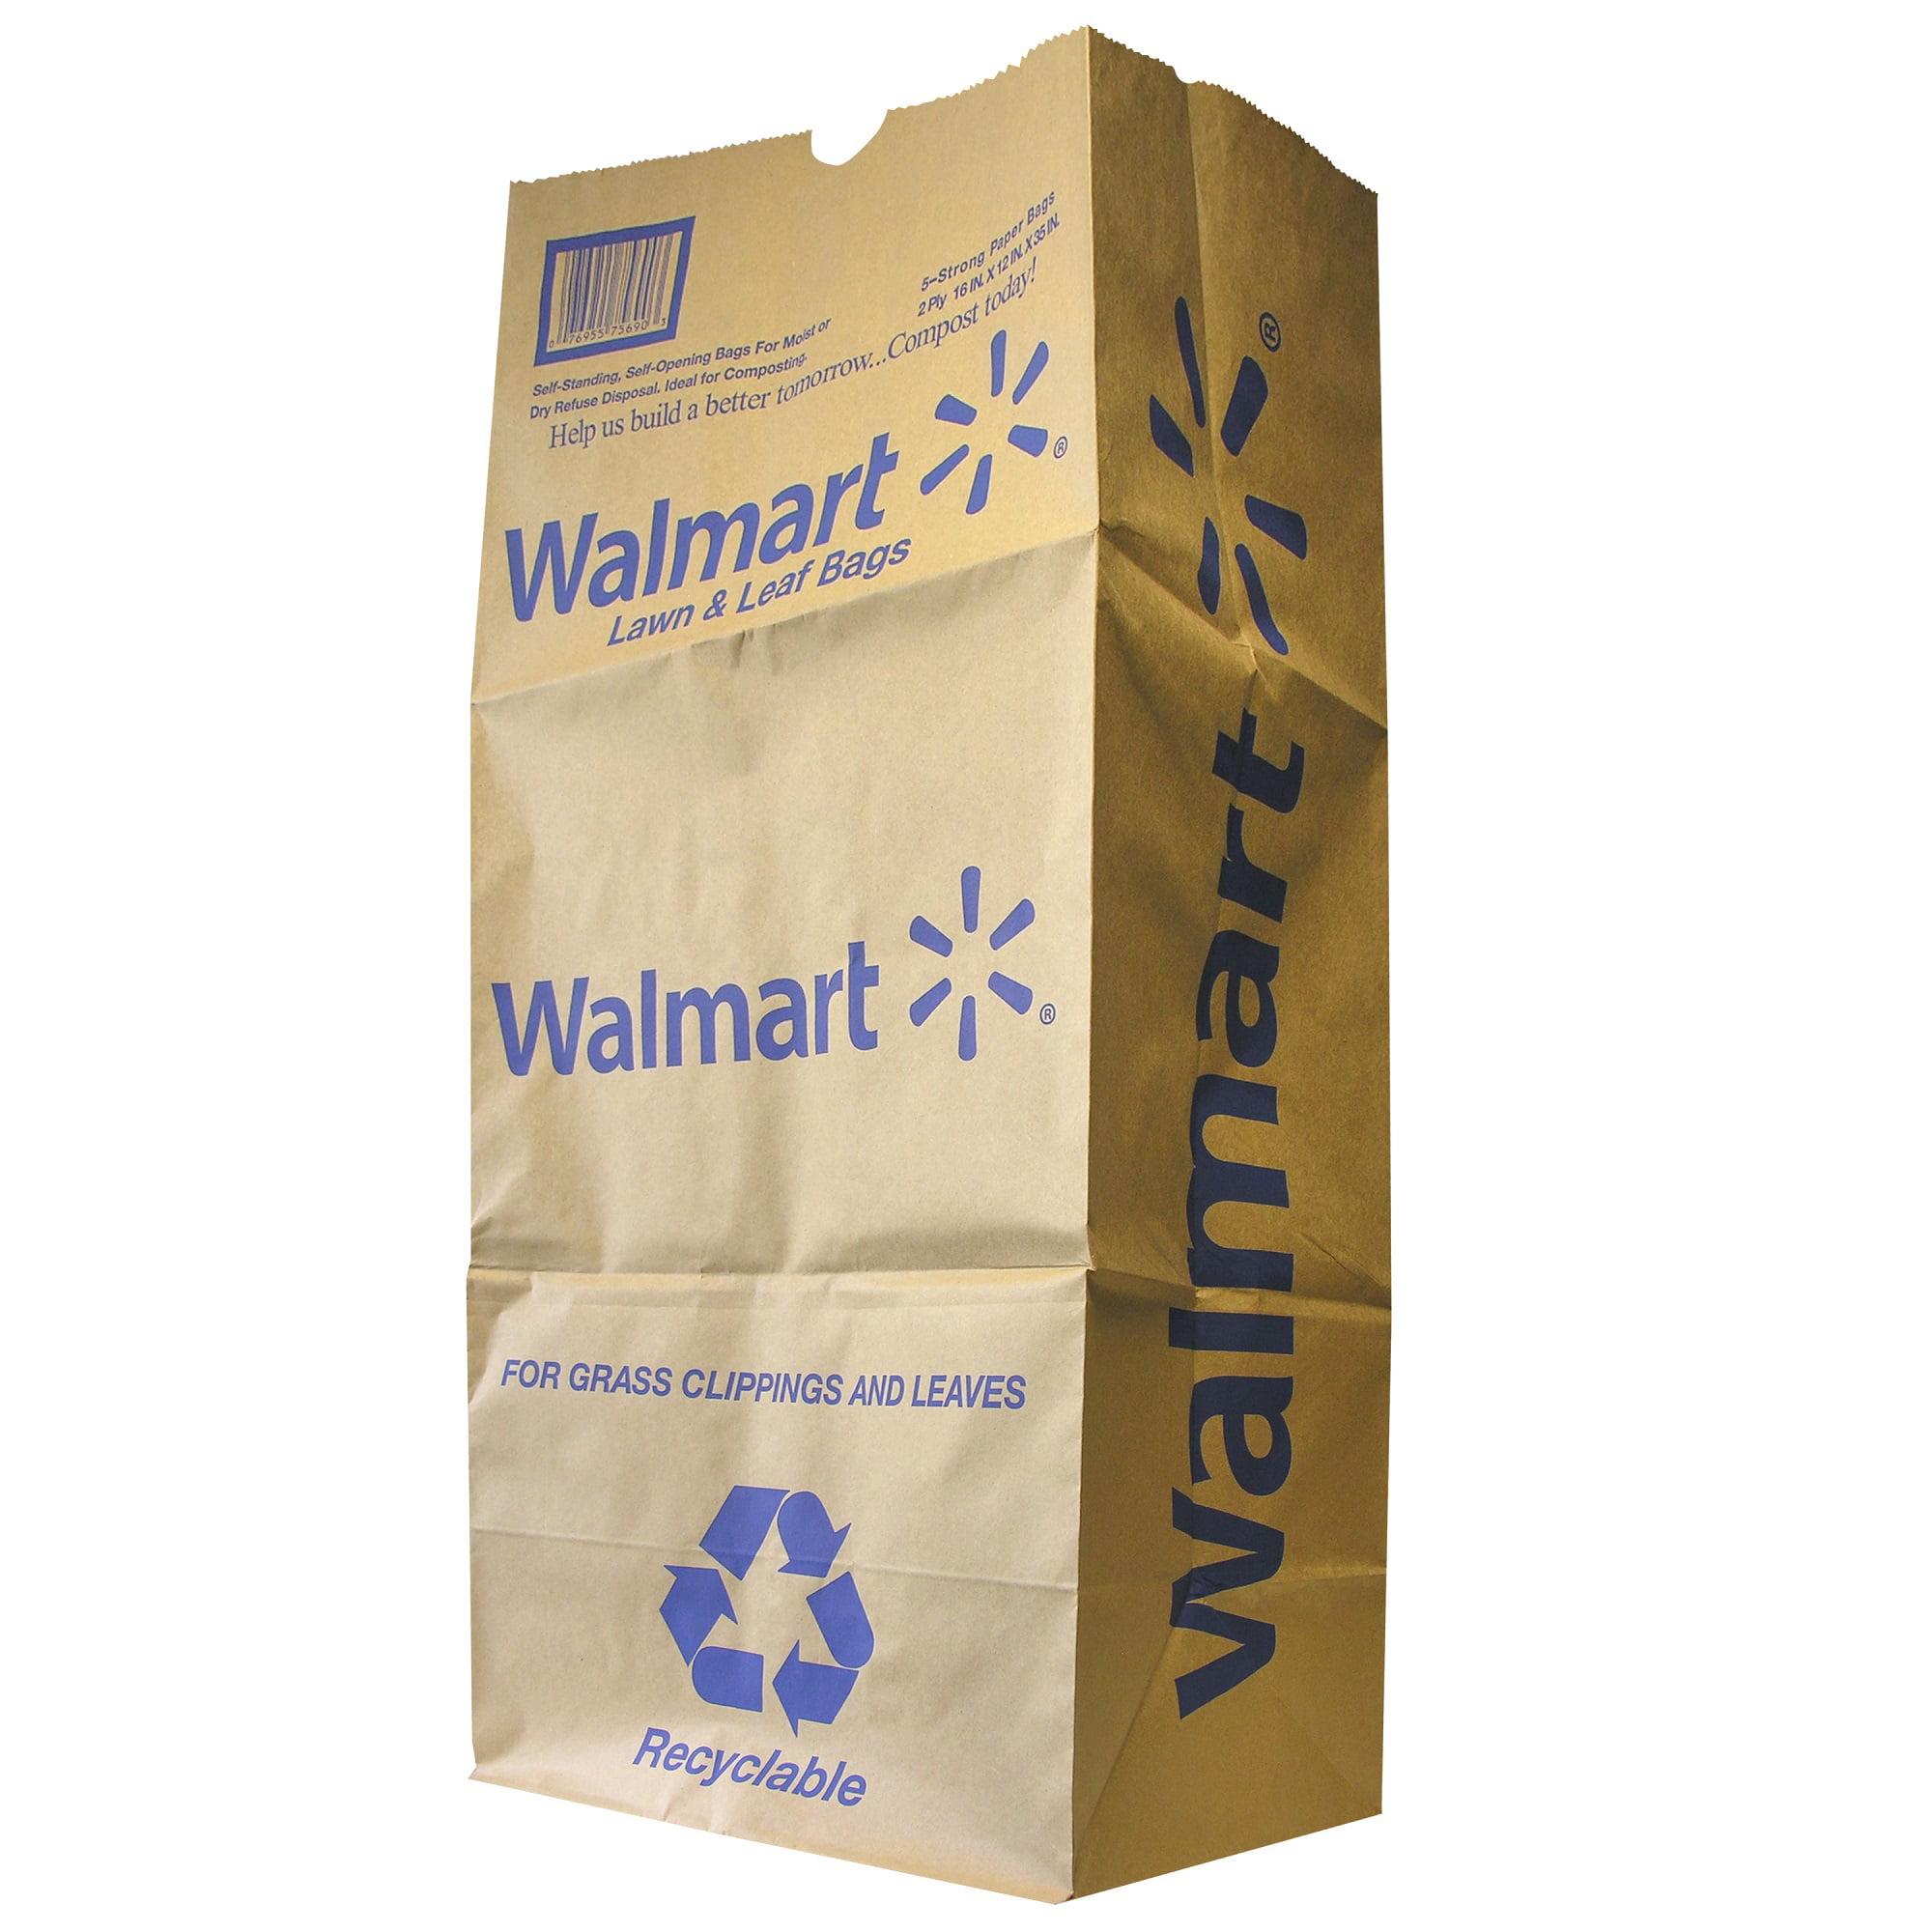 Image of Ajm Packaging 30gal Walmart Refuse Bag 5ct